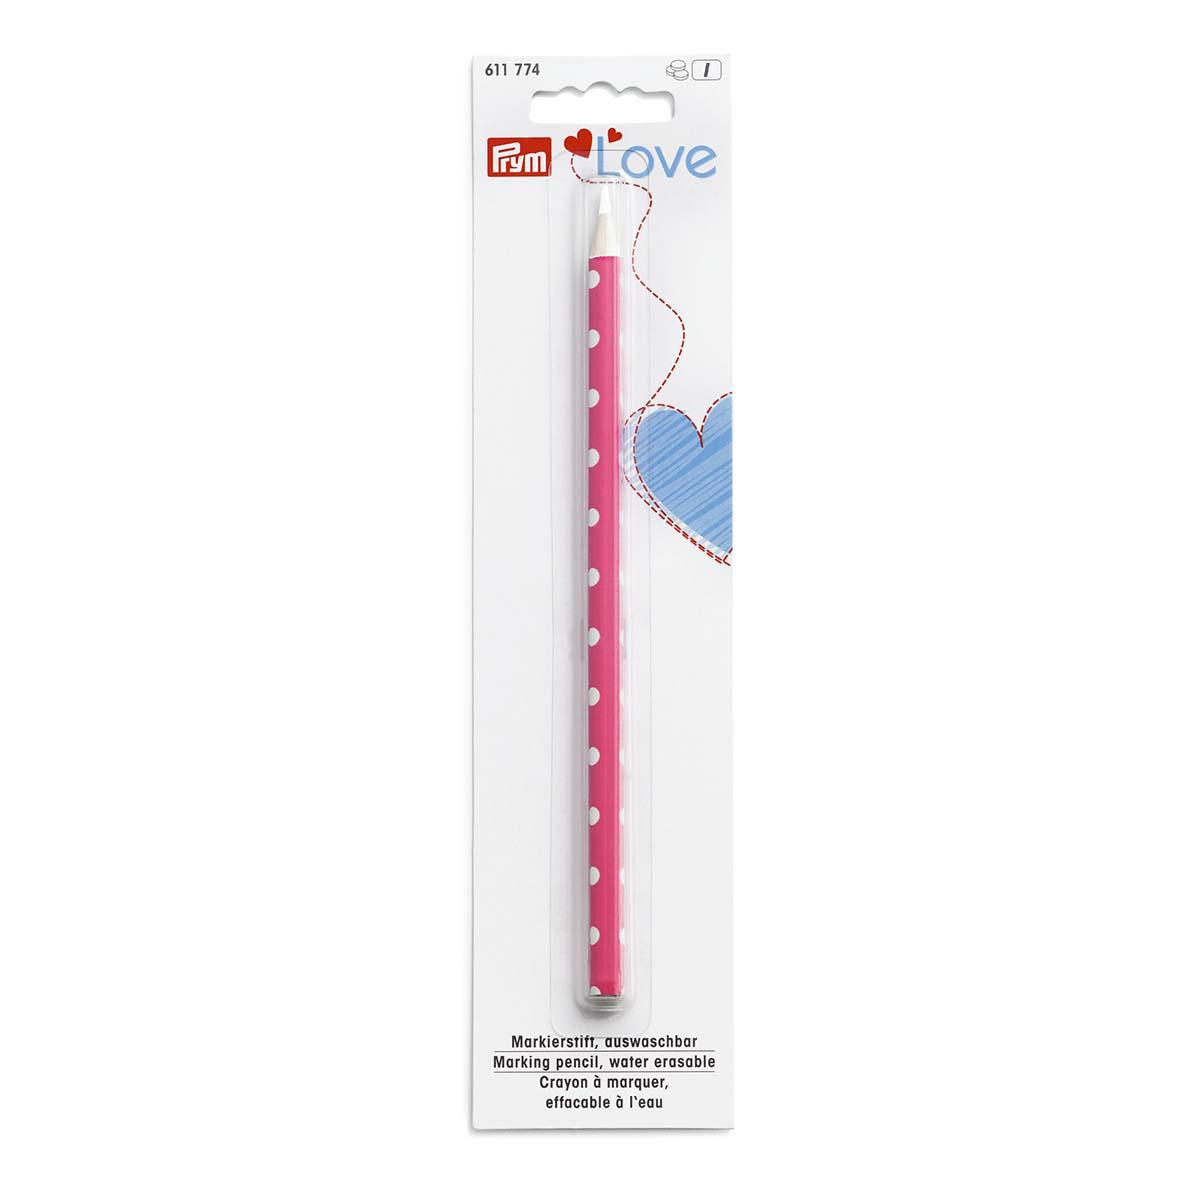 611774 Маркировочный карандаш Prym Love белый, Prym